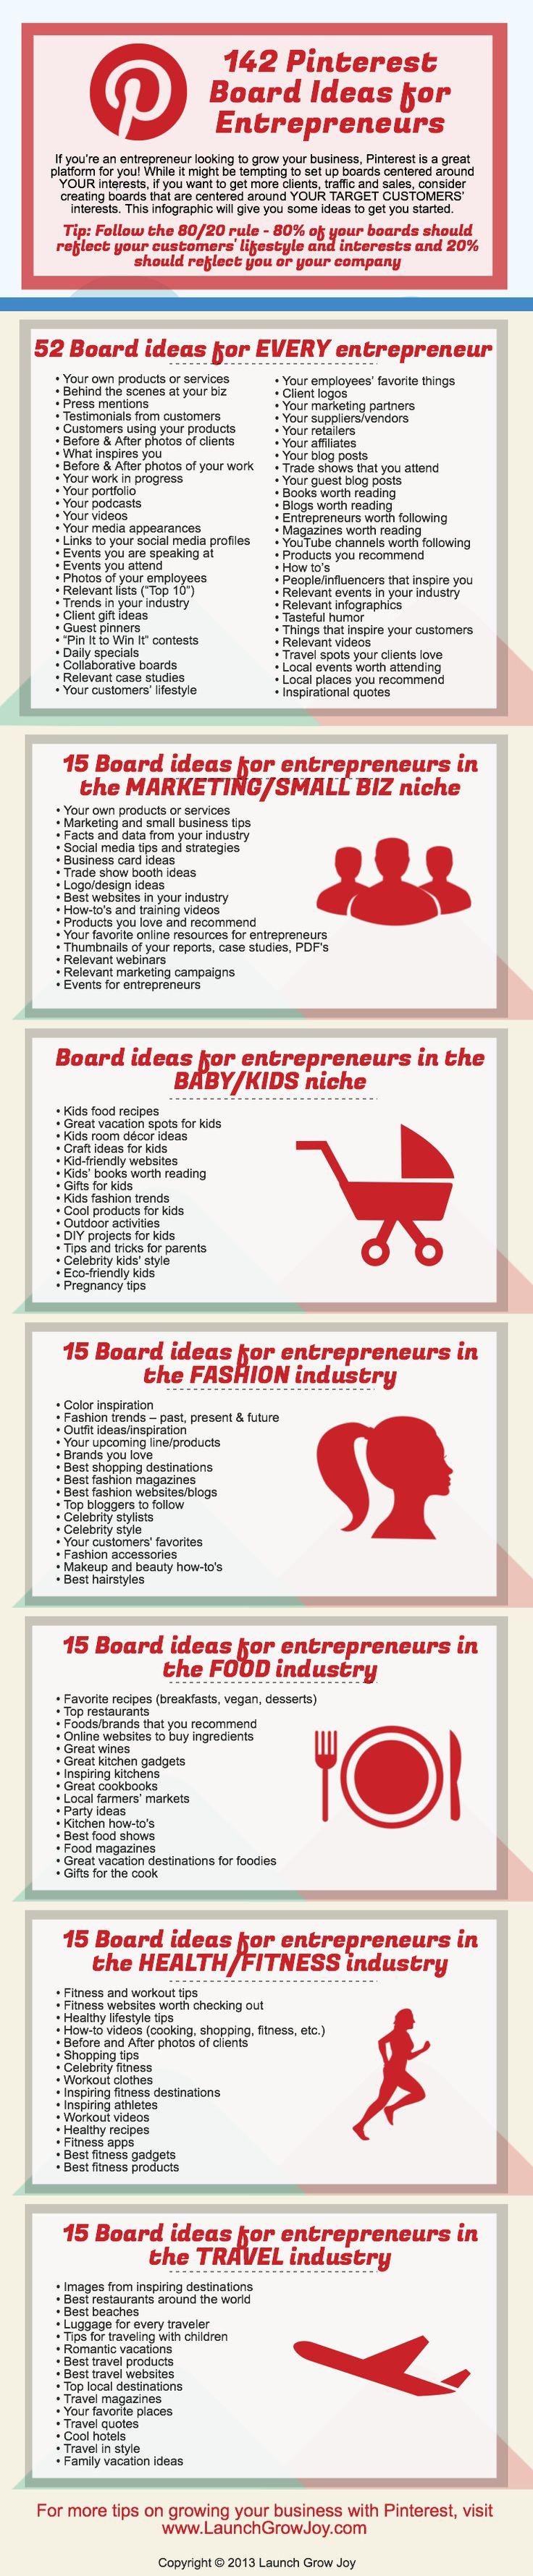 176 best social media tips images on pinterest snood tips and 142 pinterest board ideas for entrepreneurs fandeluxe Images